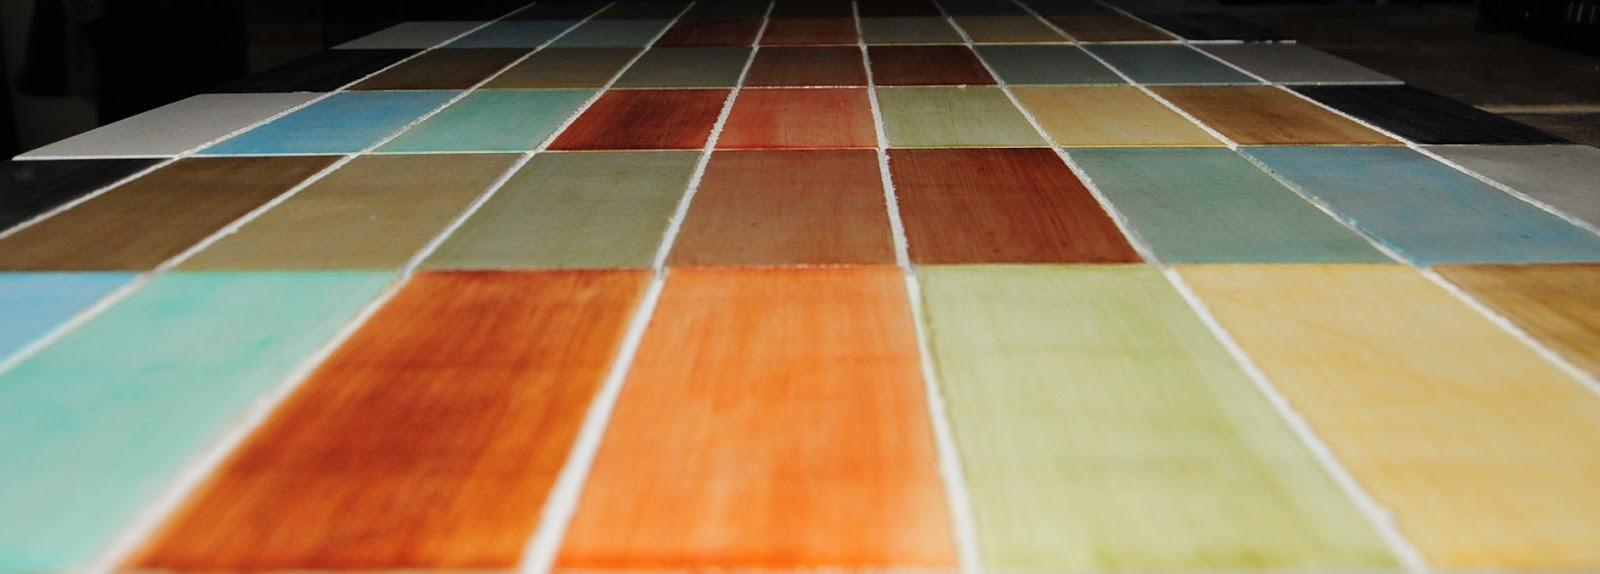 mode concrete rejuvenate and modernize concrete floors